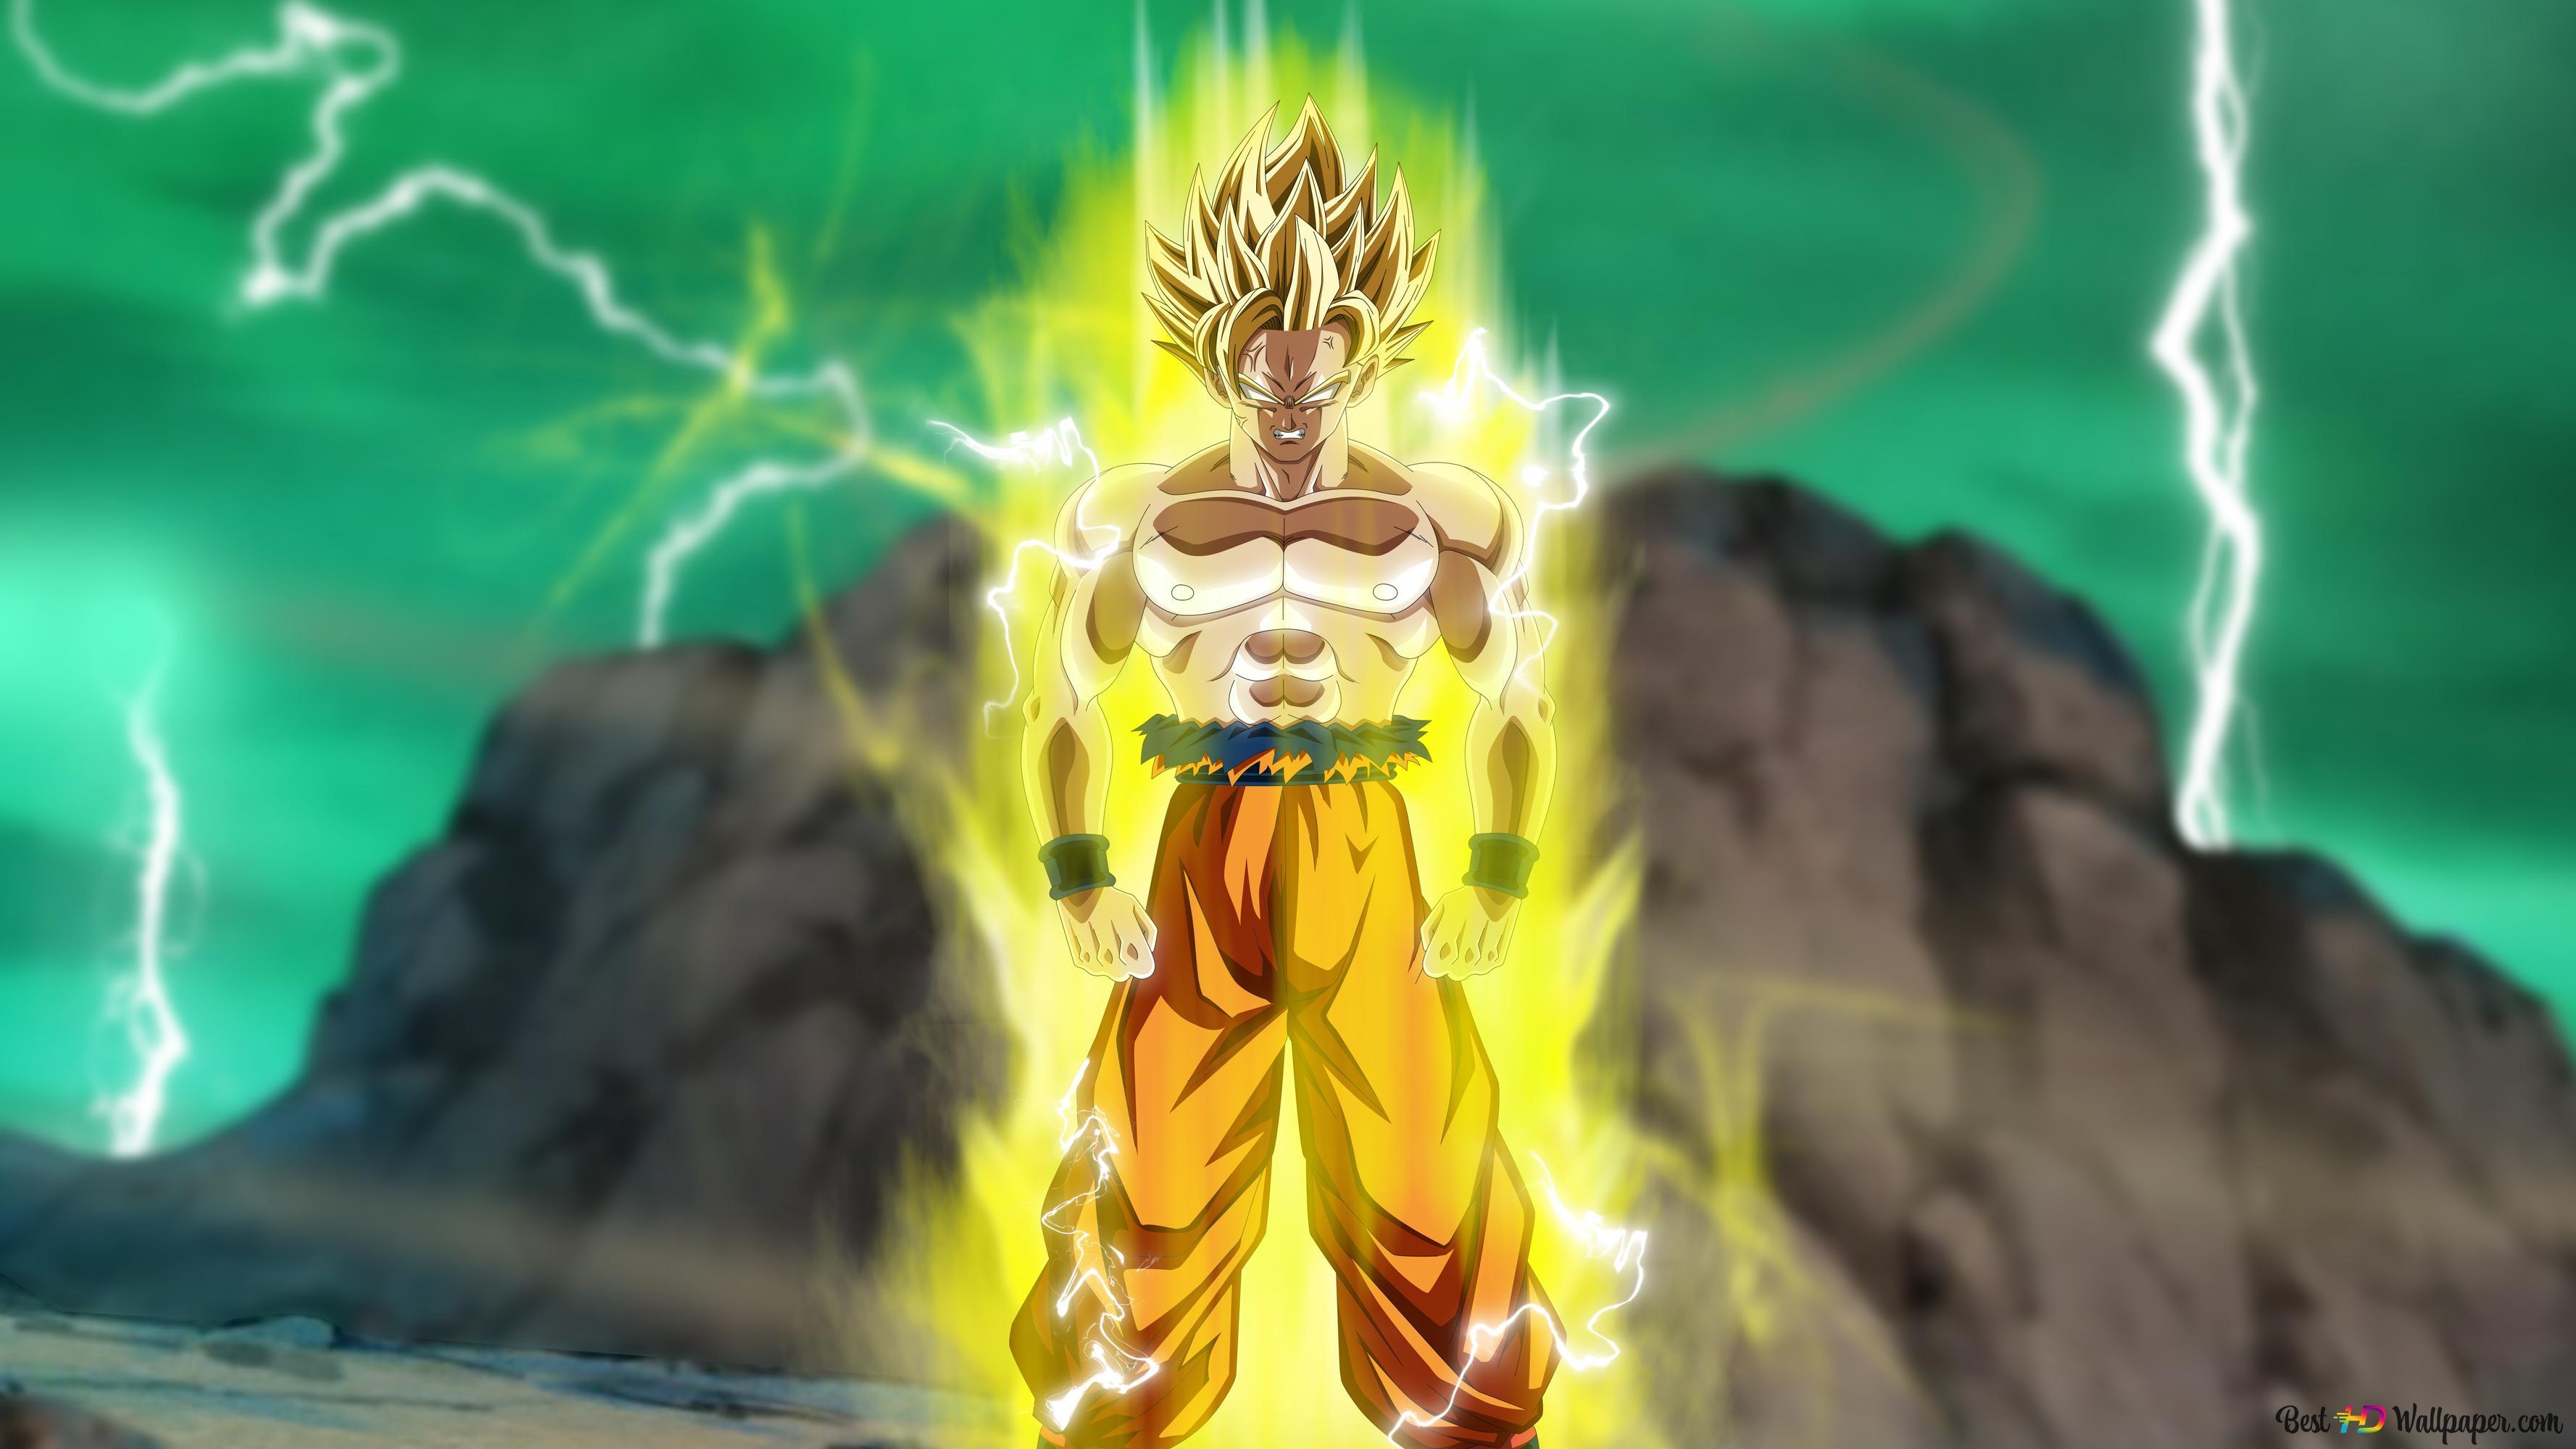 Goku Transform To Super Saiyan 2 Namek Saga Hd Wallpaper Download